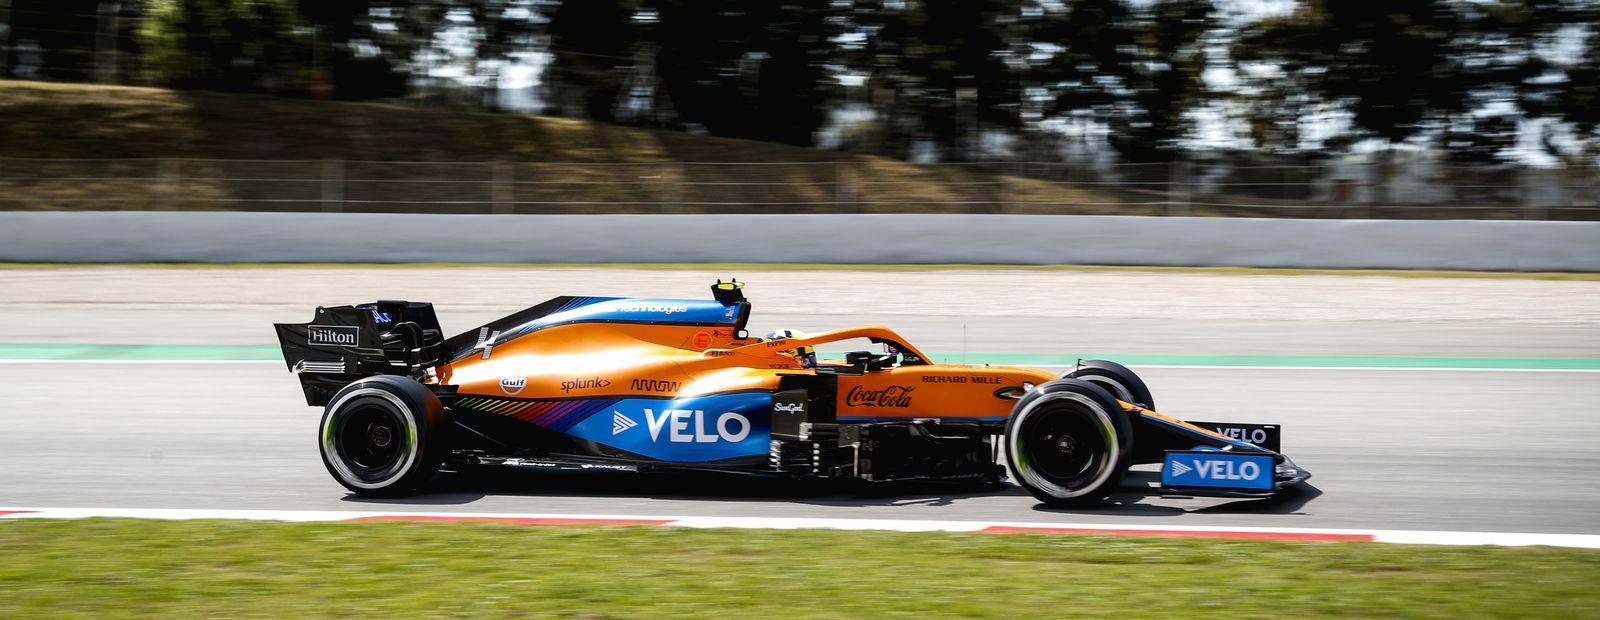 2021 Spanish Grand Prix – Free Practice